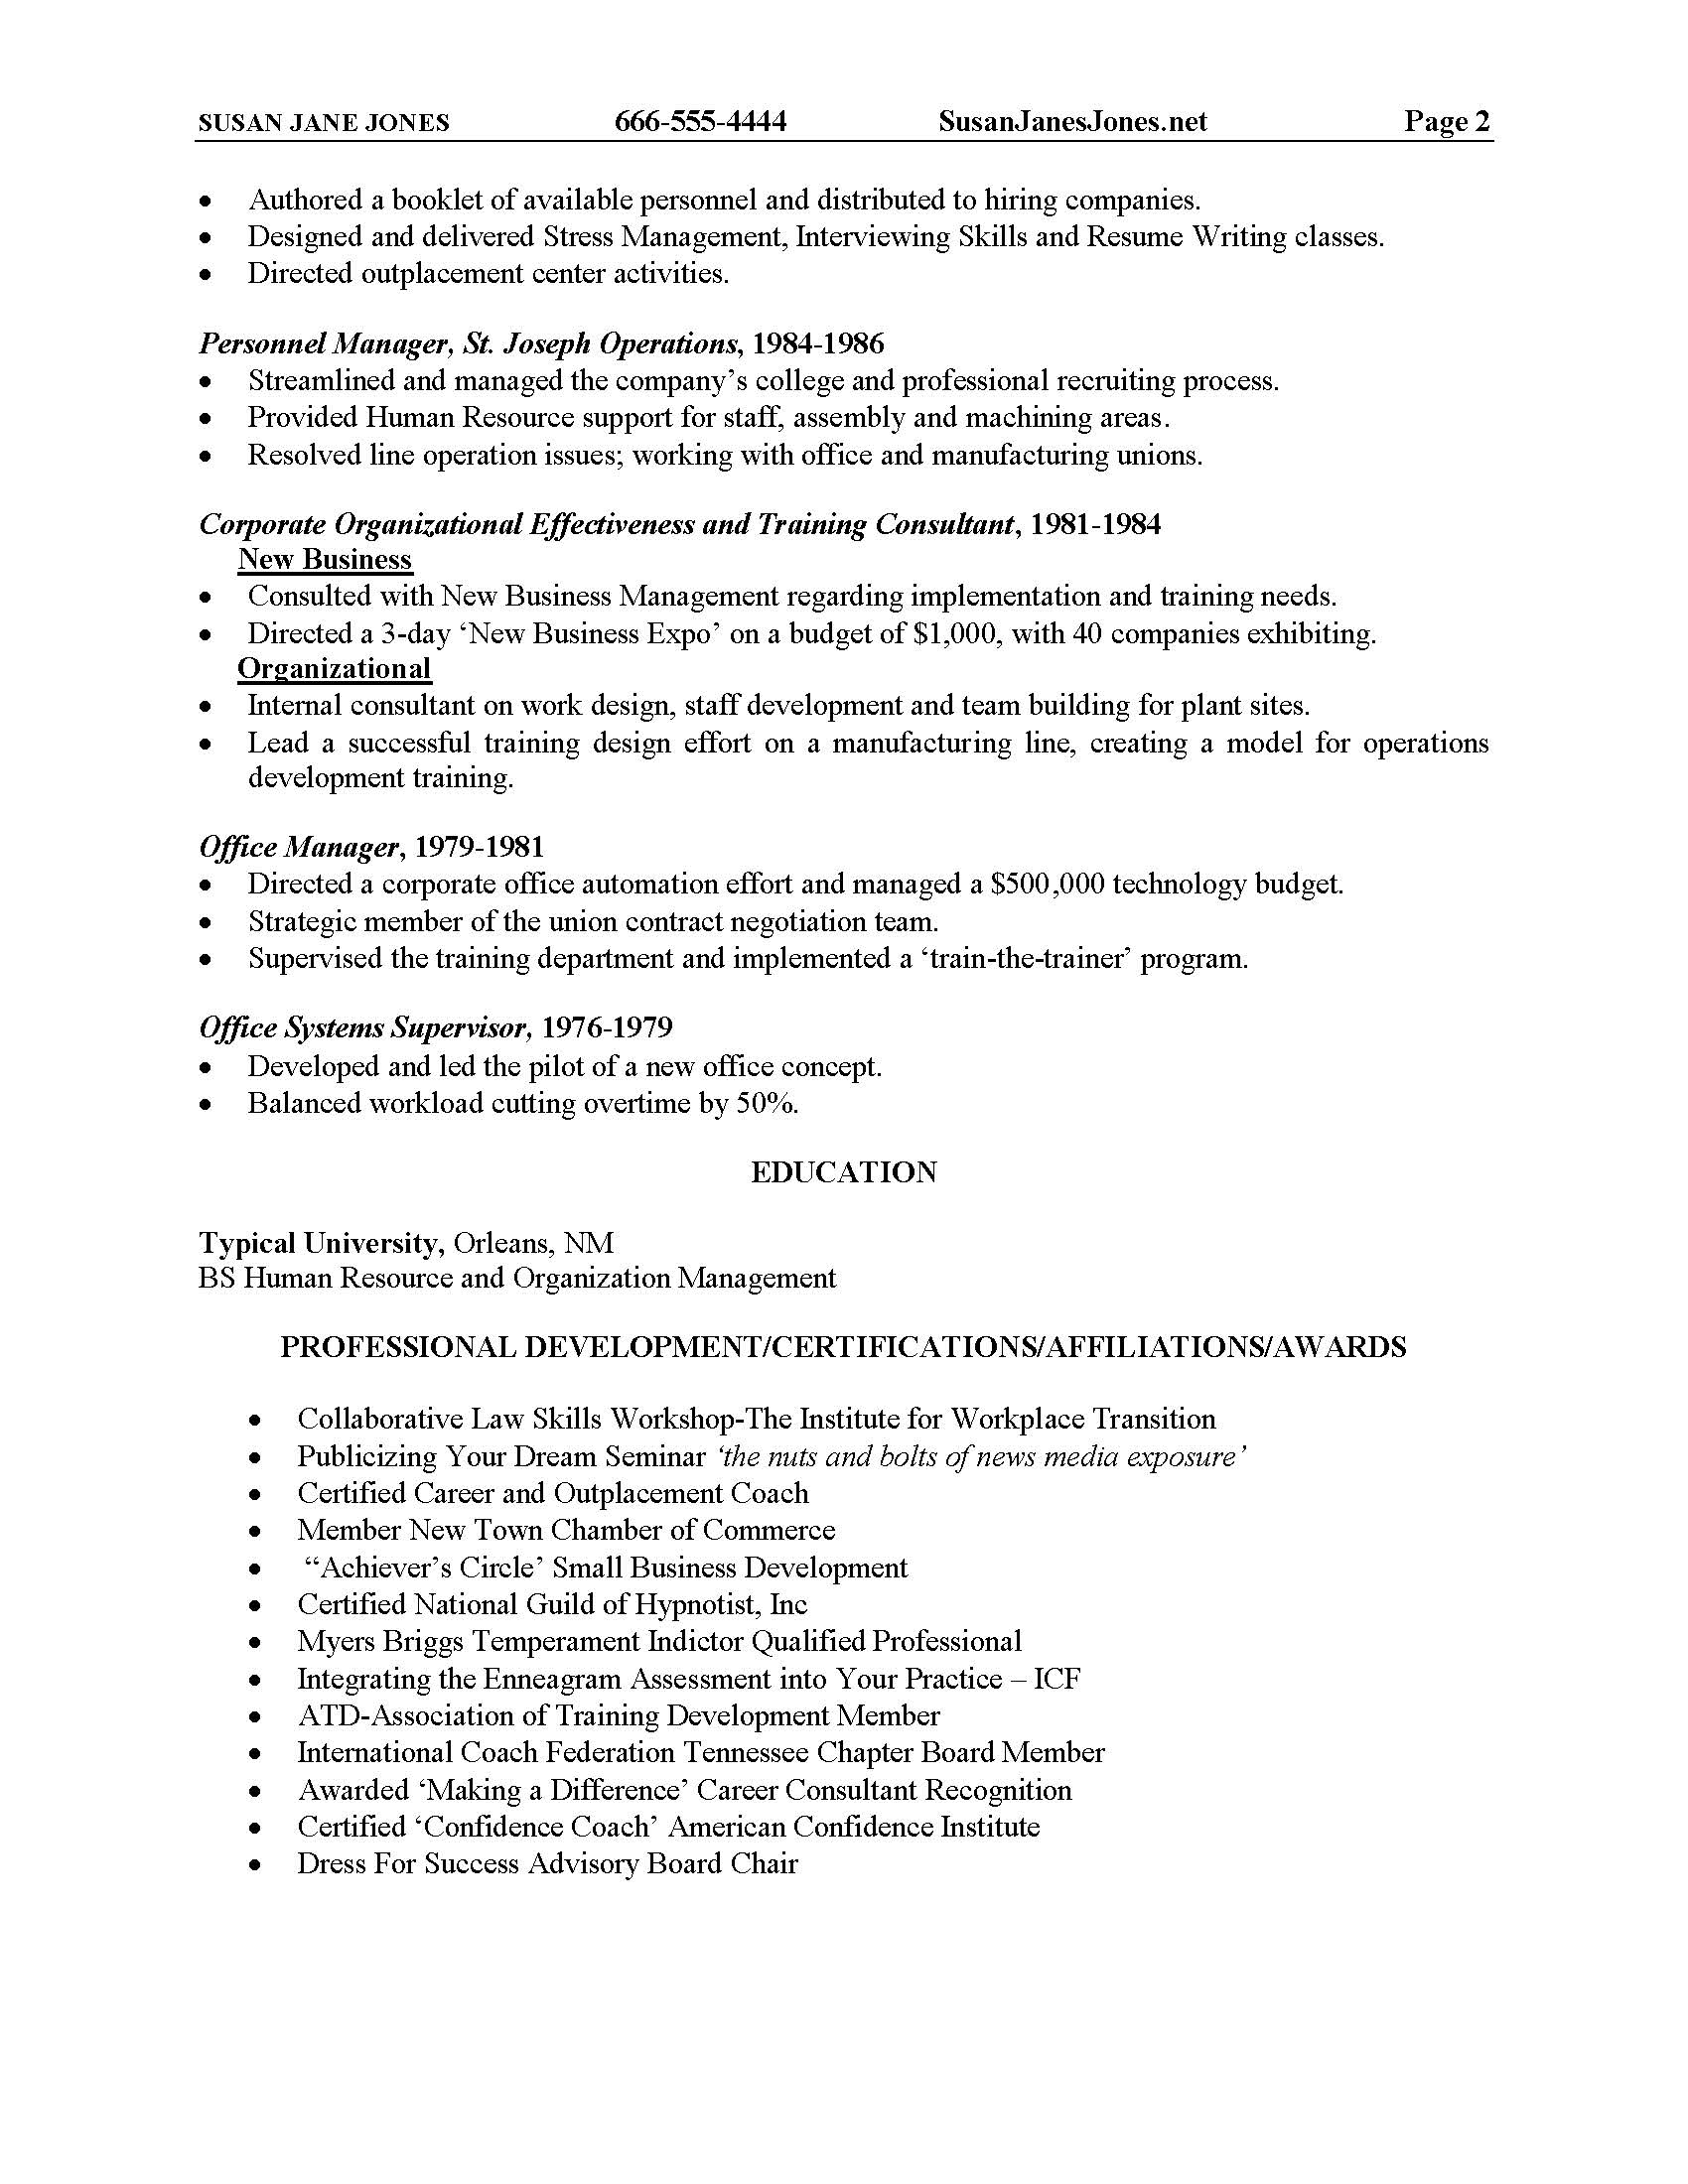 Resume-Sample-2_Page_2